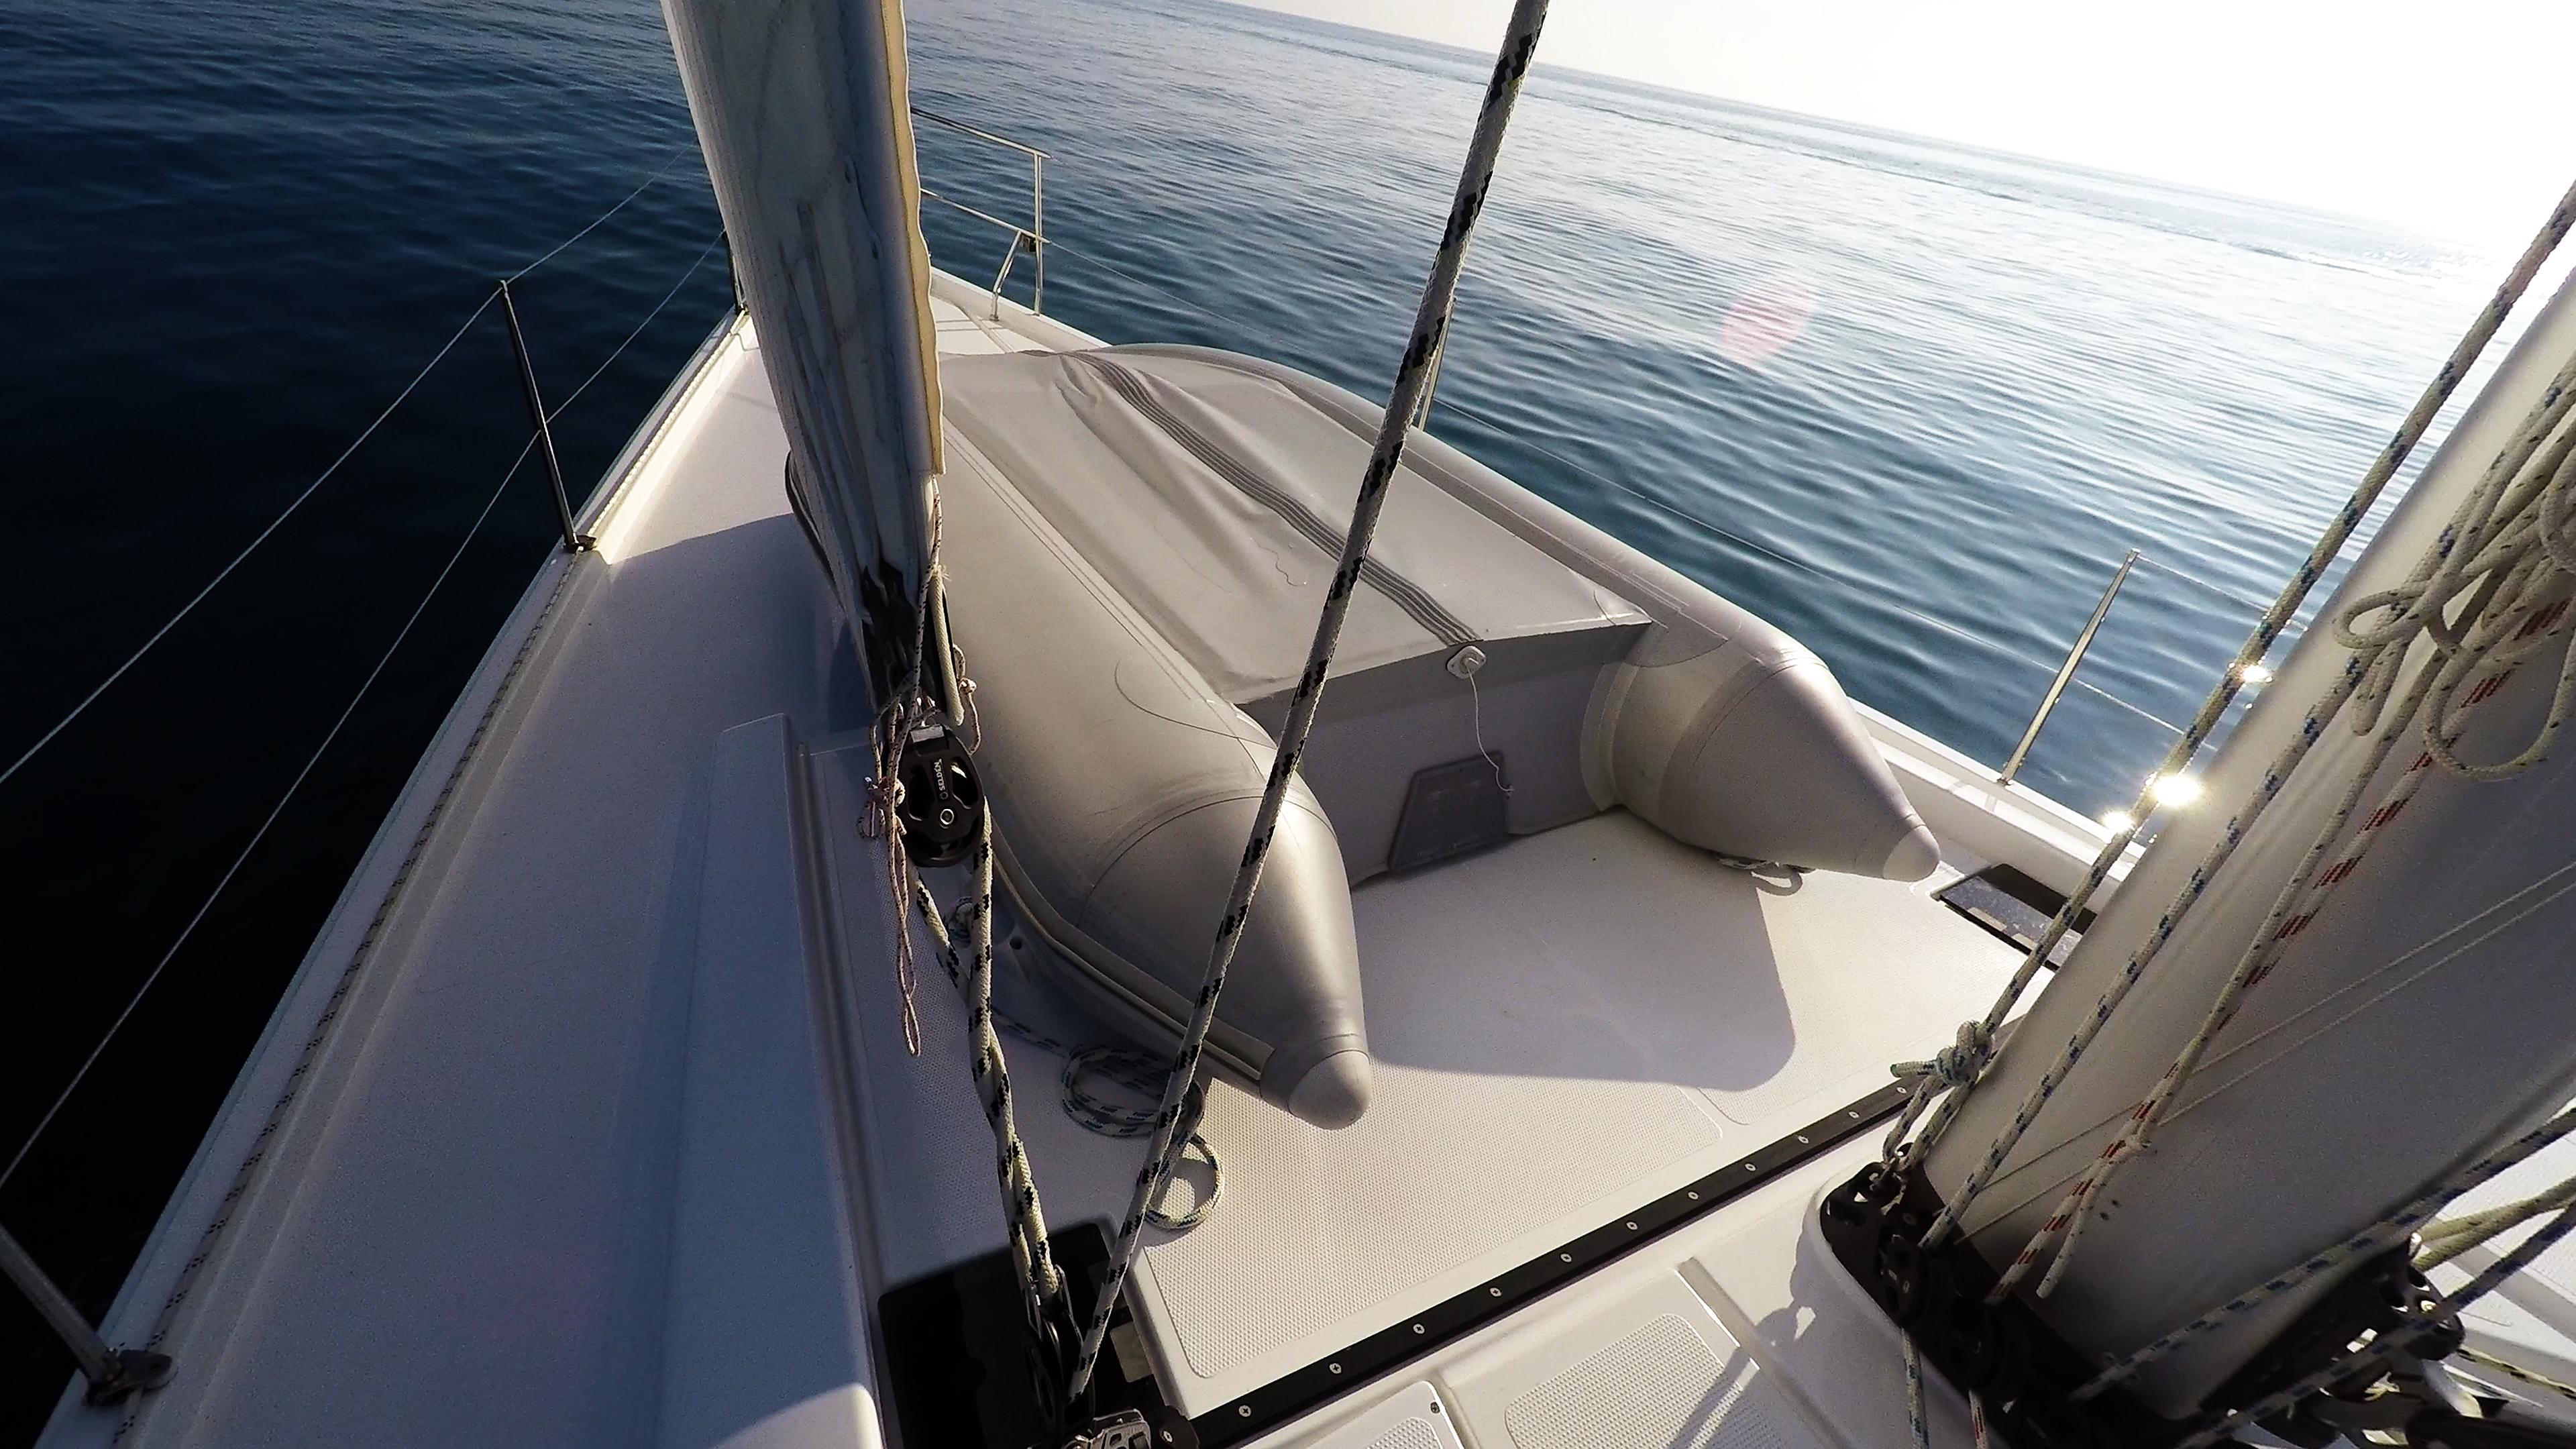 sailing yacht tender sailboat bow dinghy sailing deck